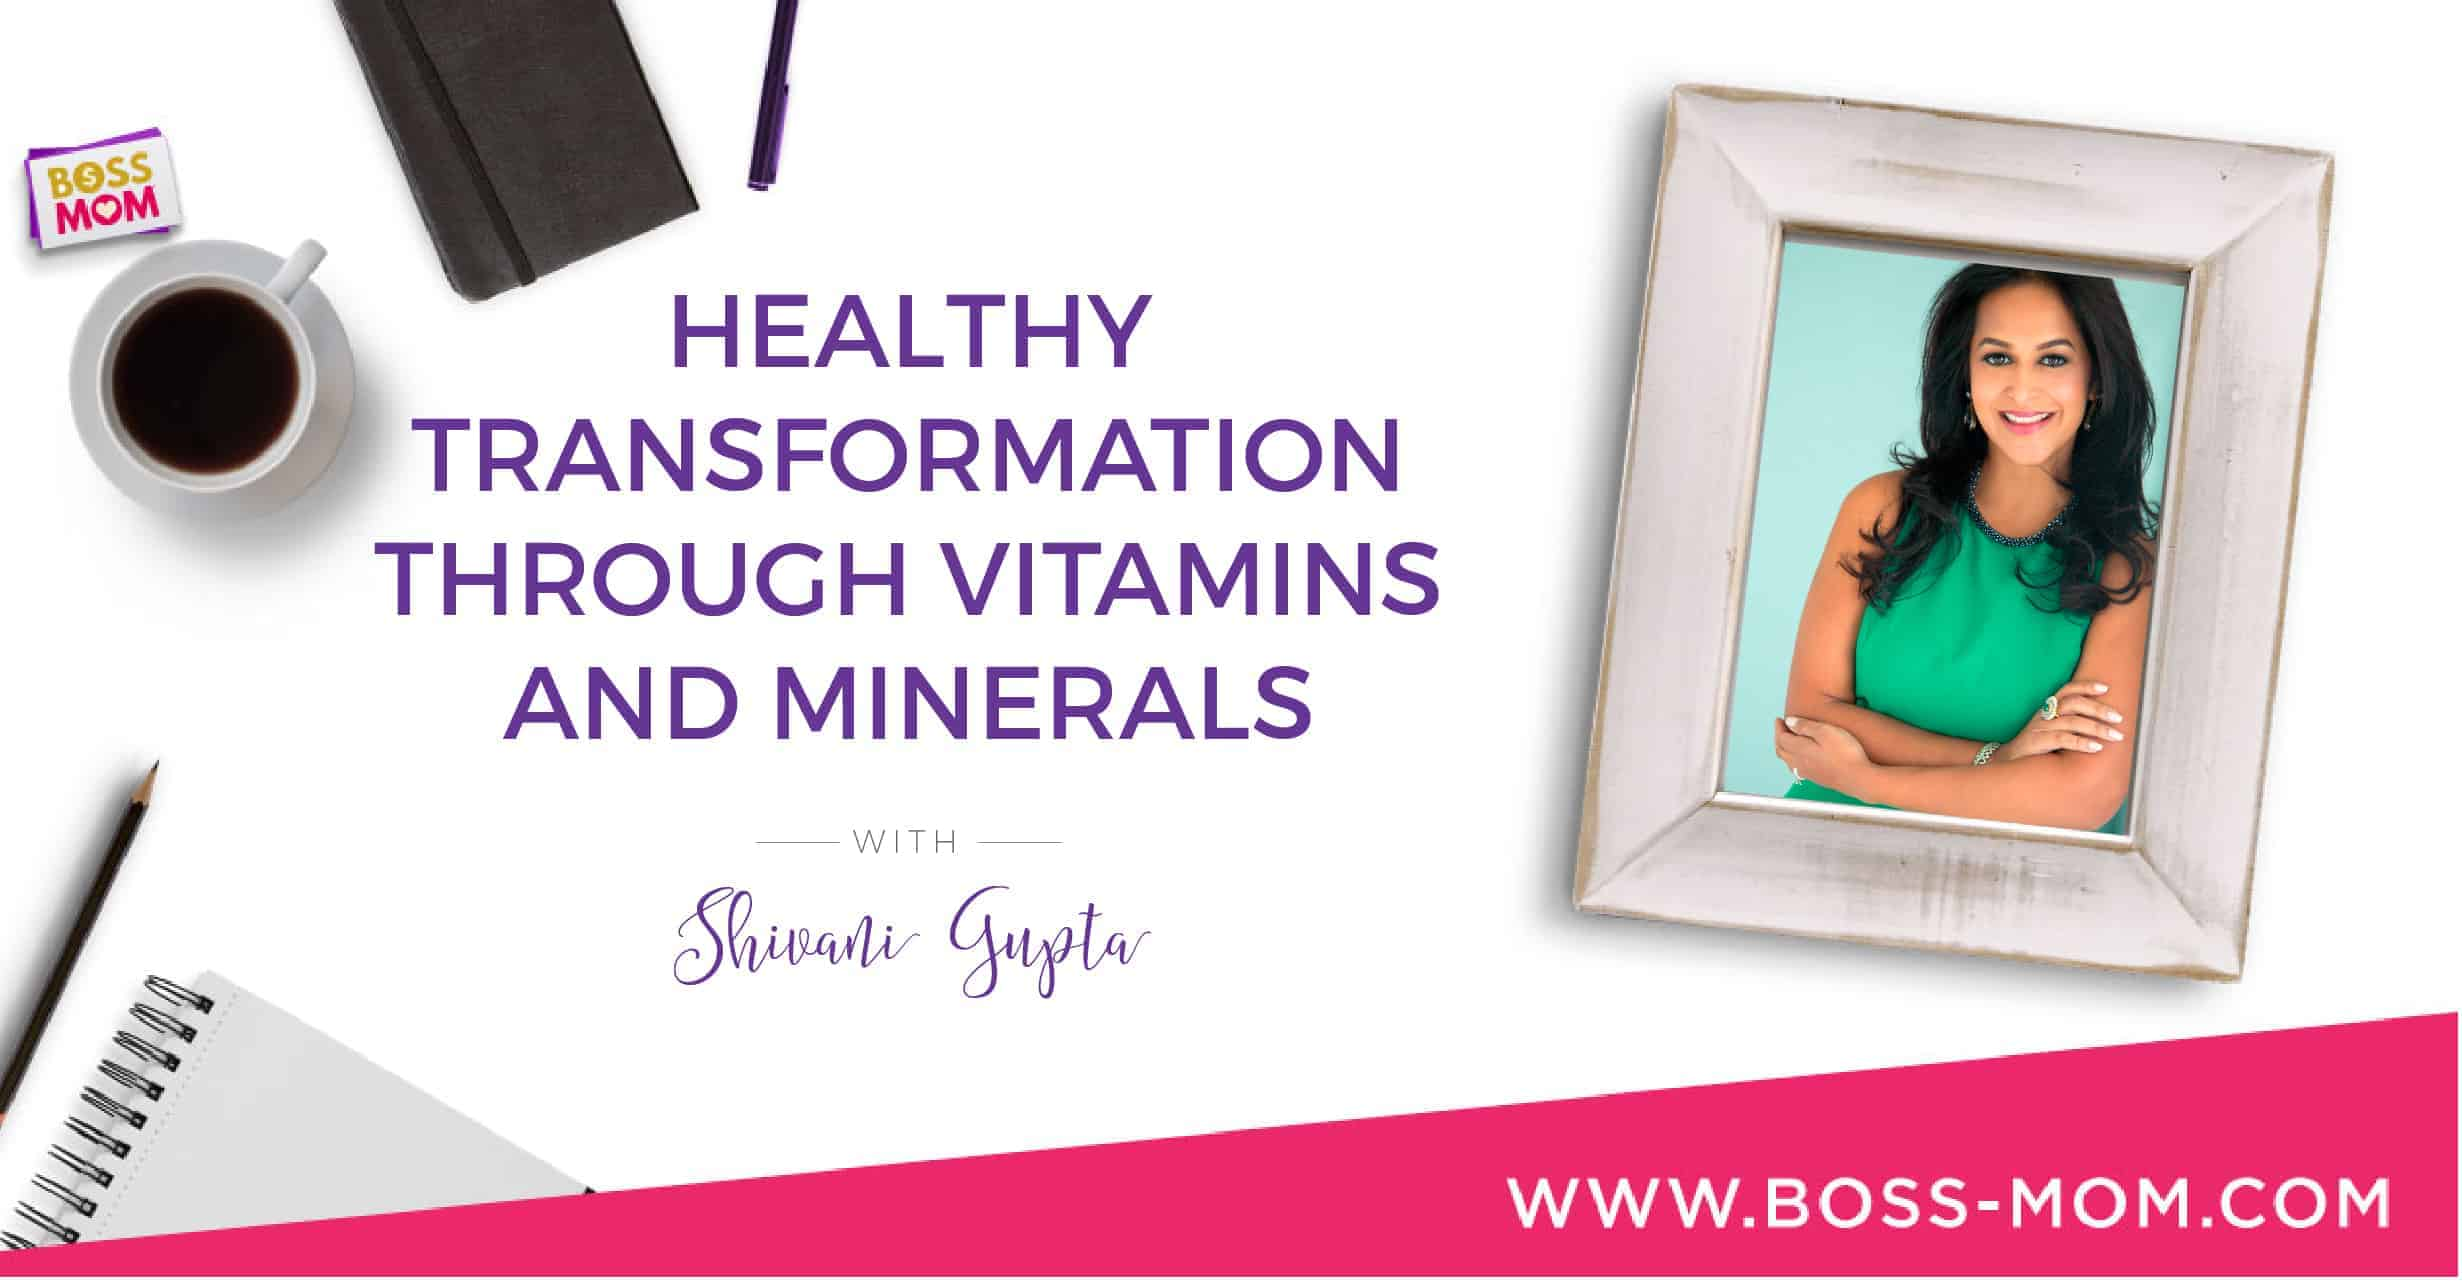 Episode 195: Healthy Transformation Through Vitamins and Minerals with Shivani Gupta